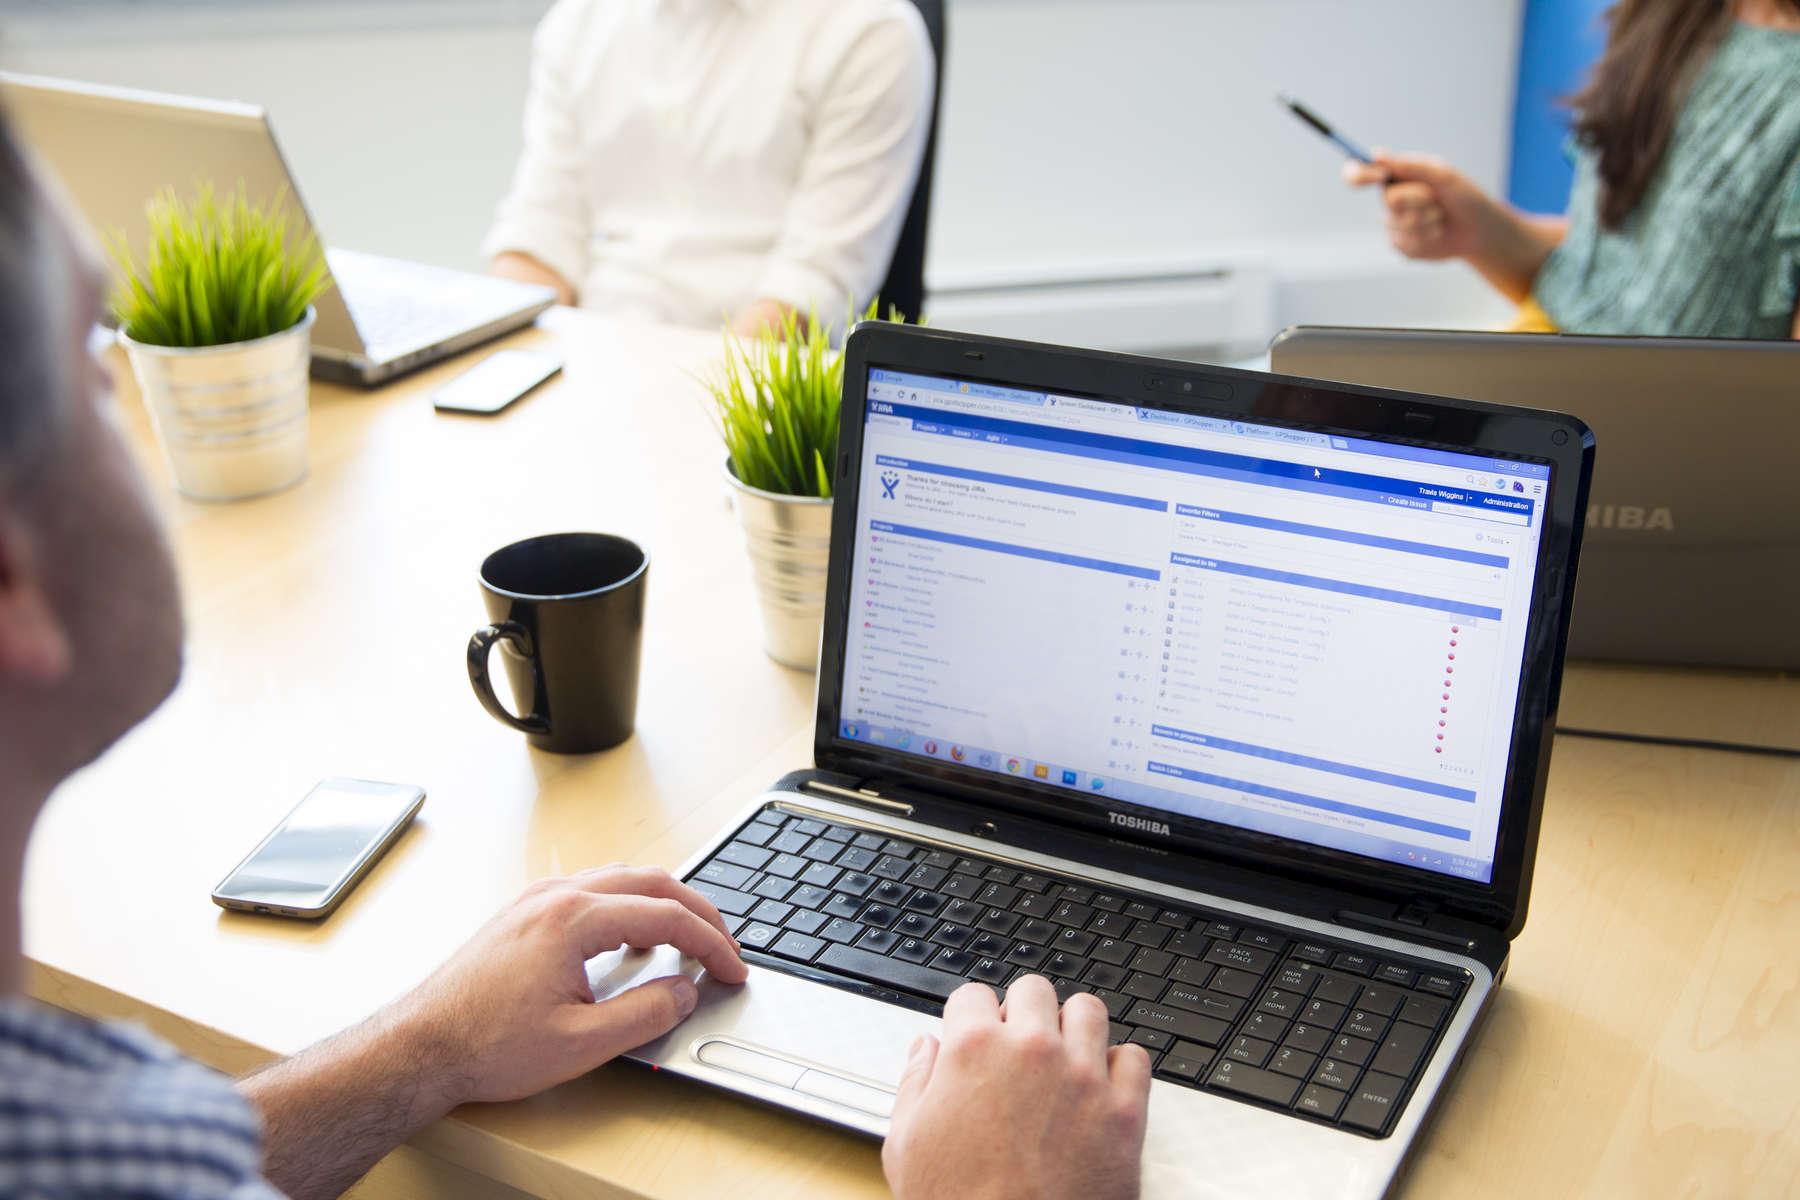 corporate-meeting-laptops